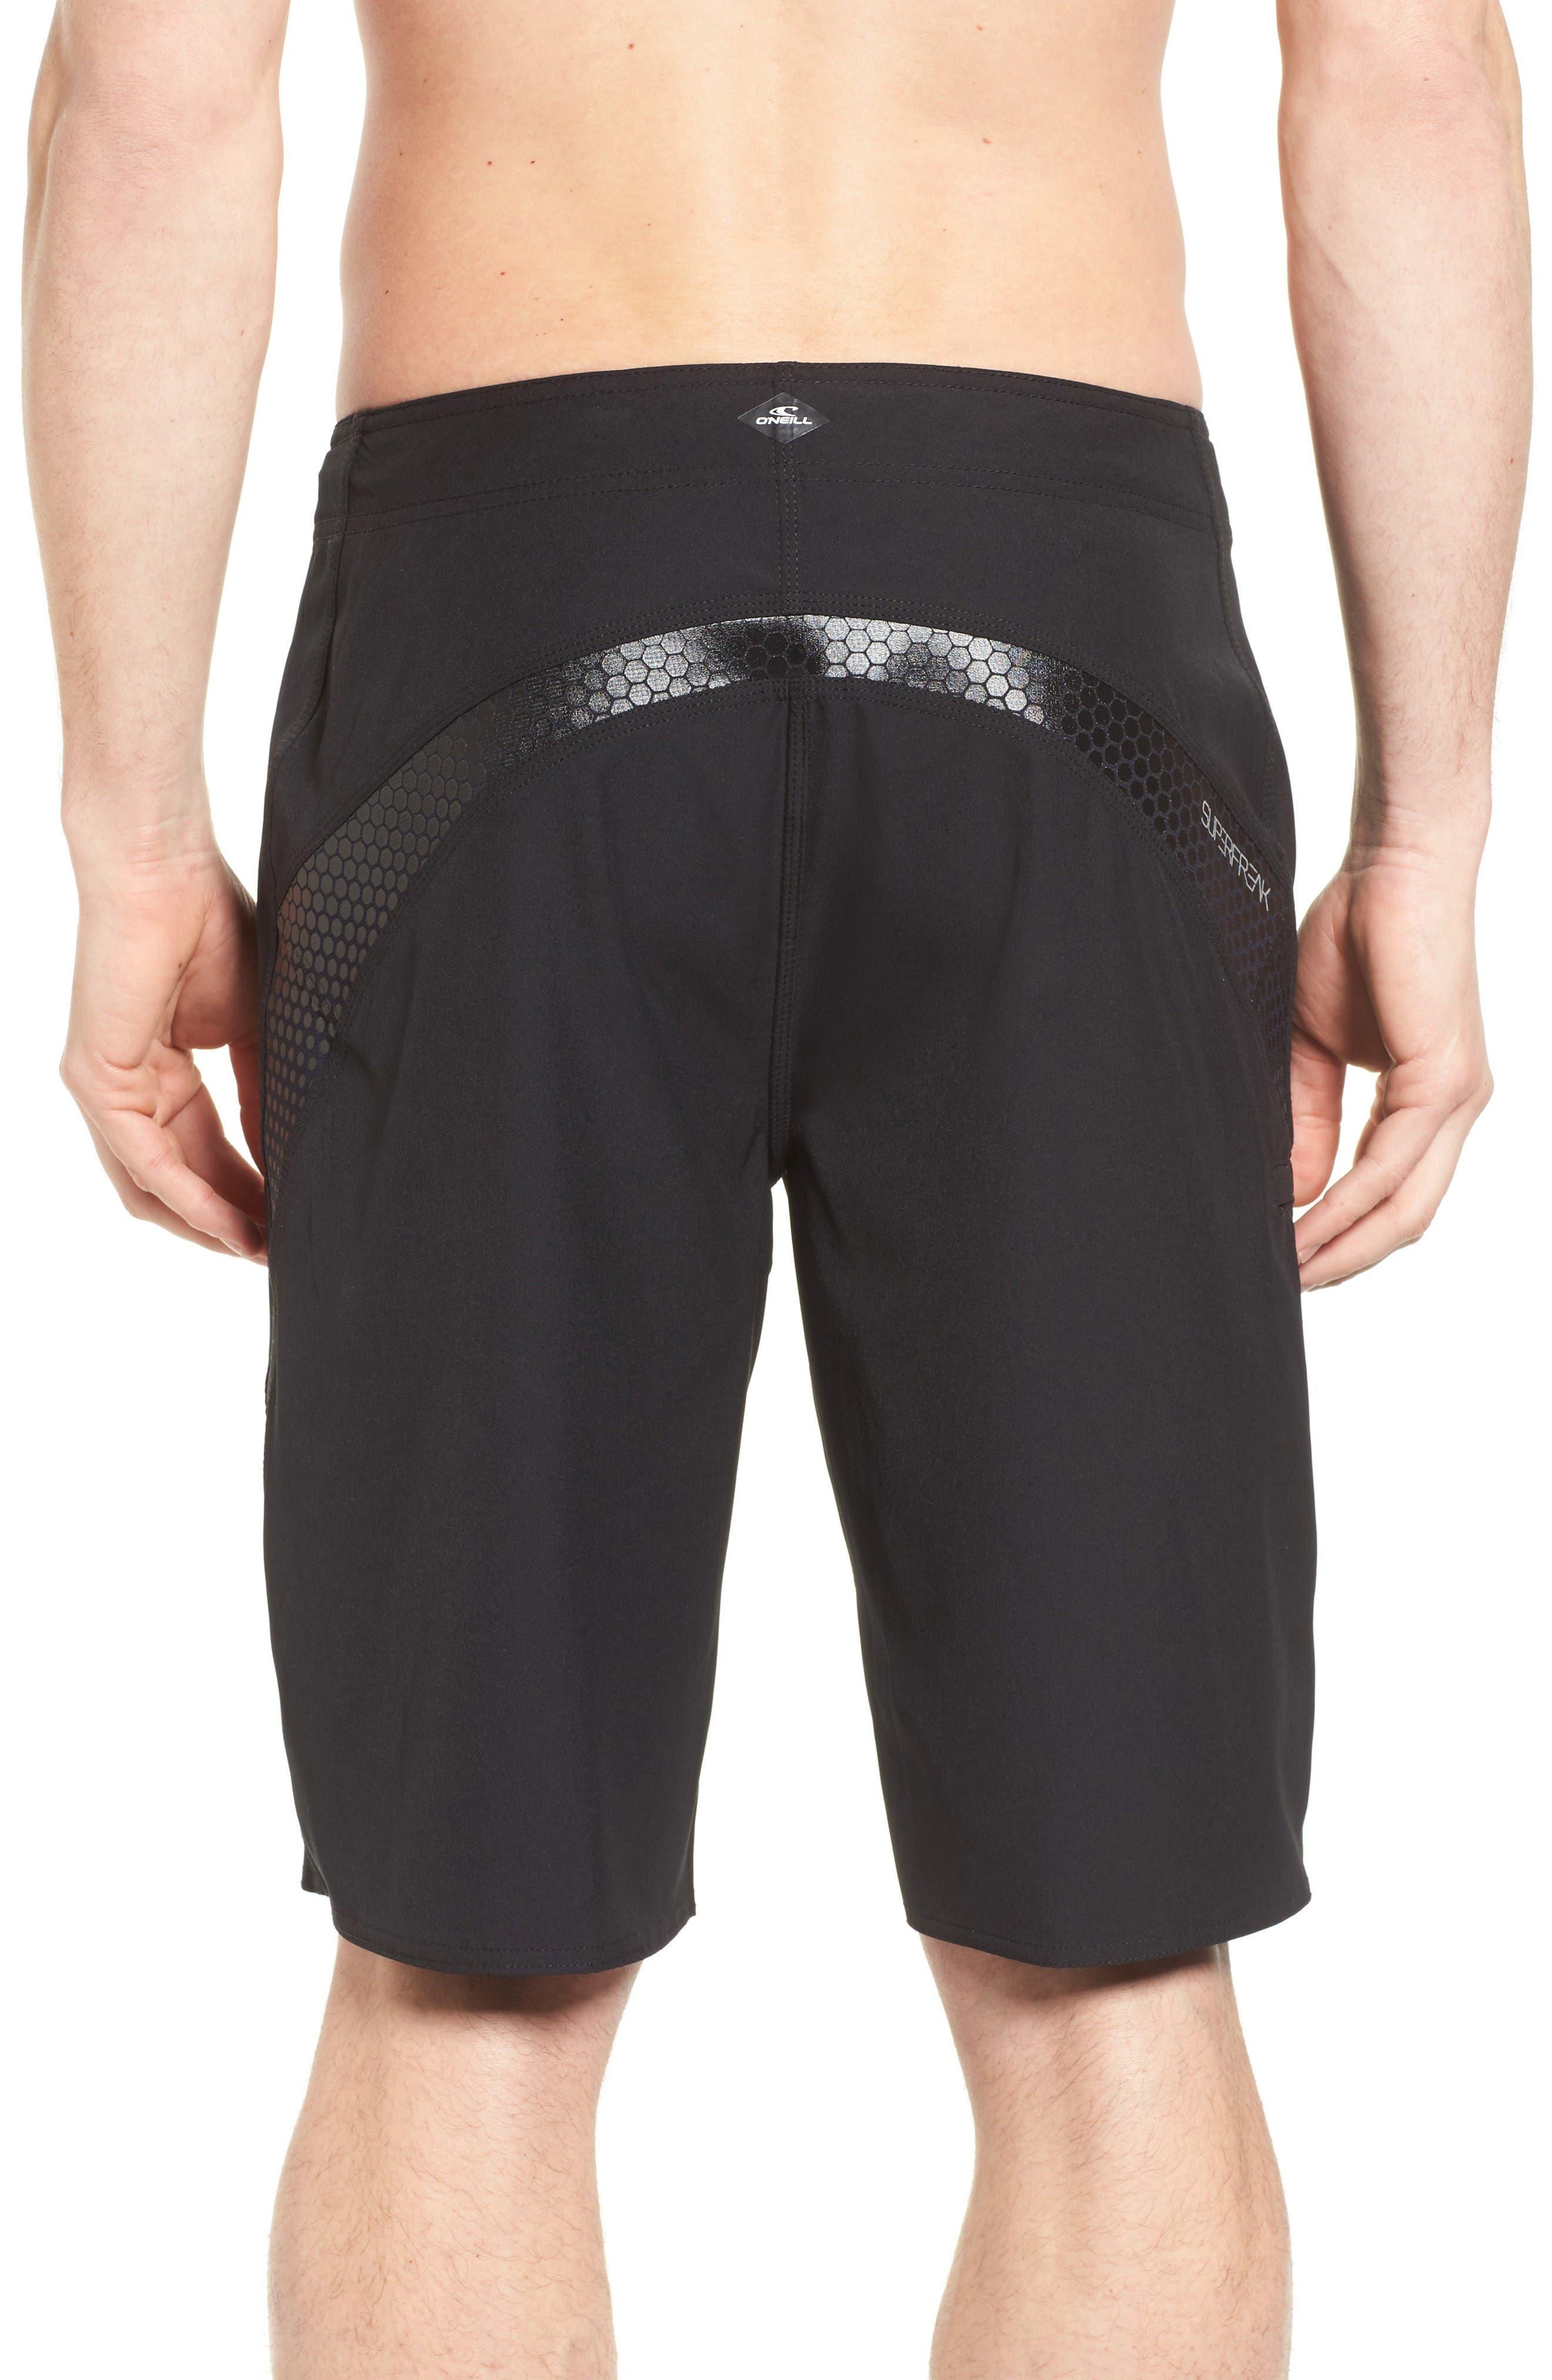 Superfreak Board Shorts,                             Alternate thumbnail 2, color,                             Black